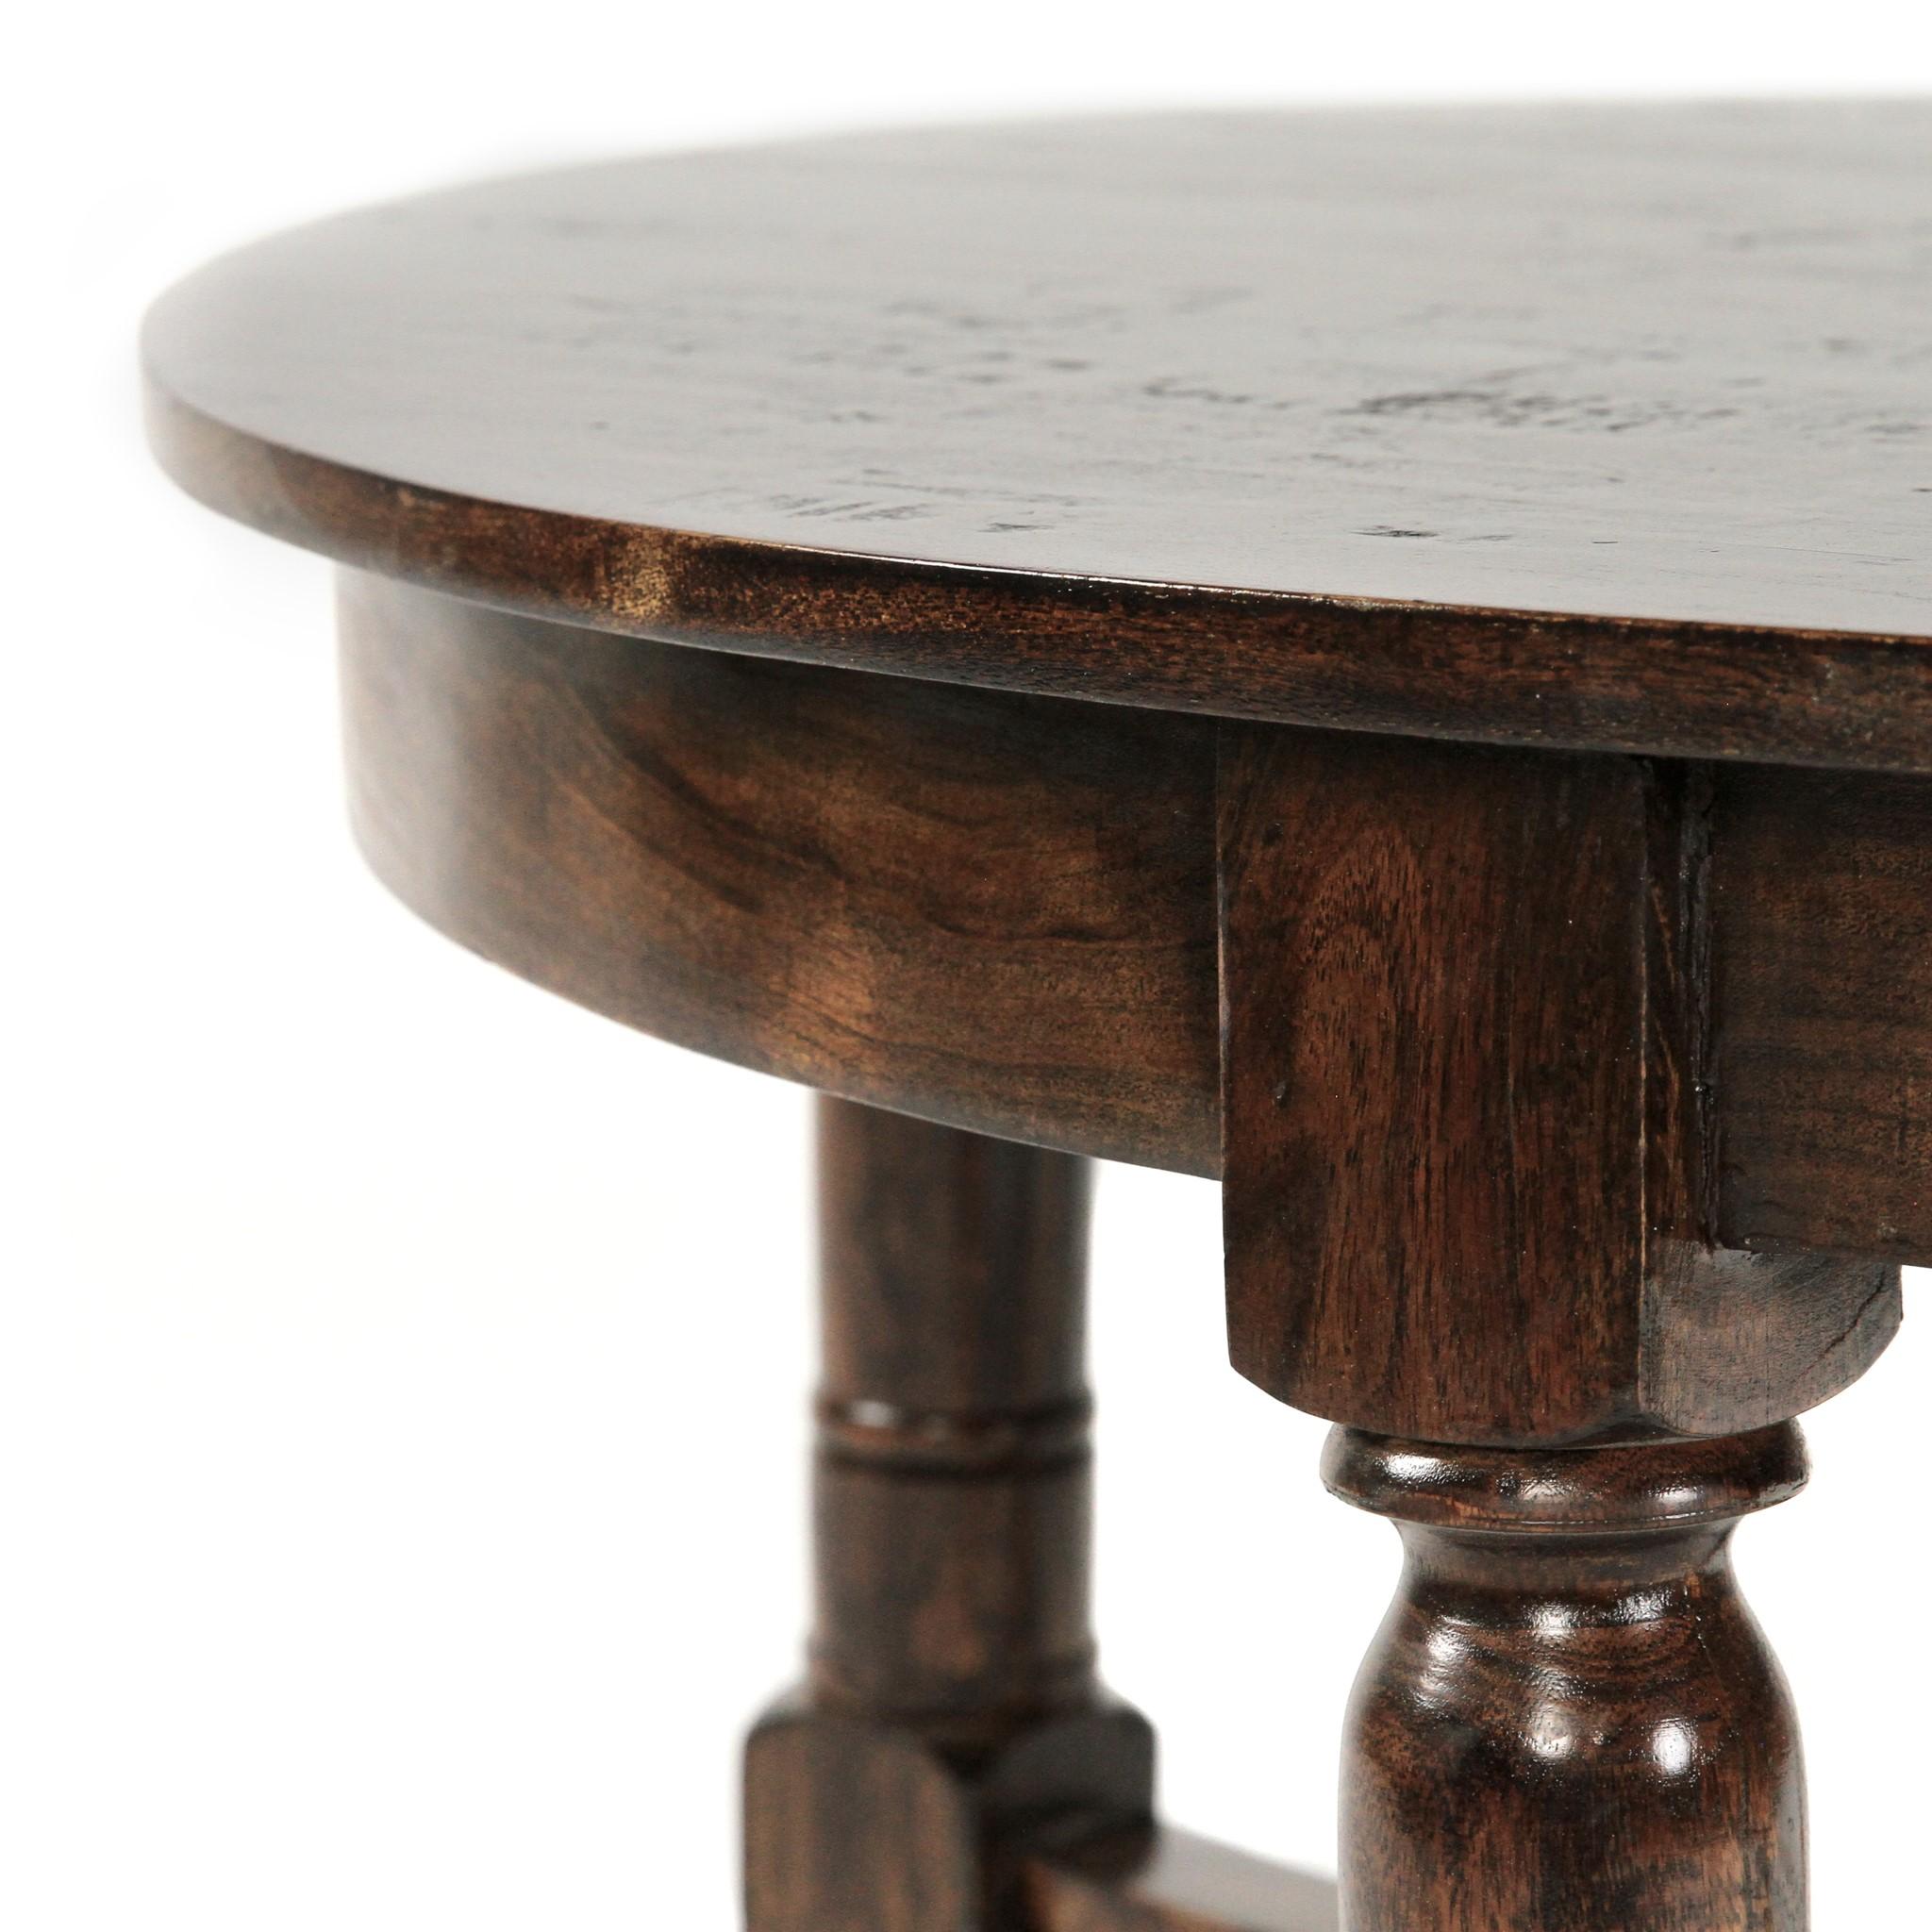 German Round Coffee Table 40x40x20